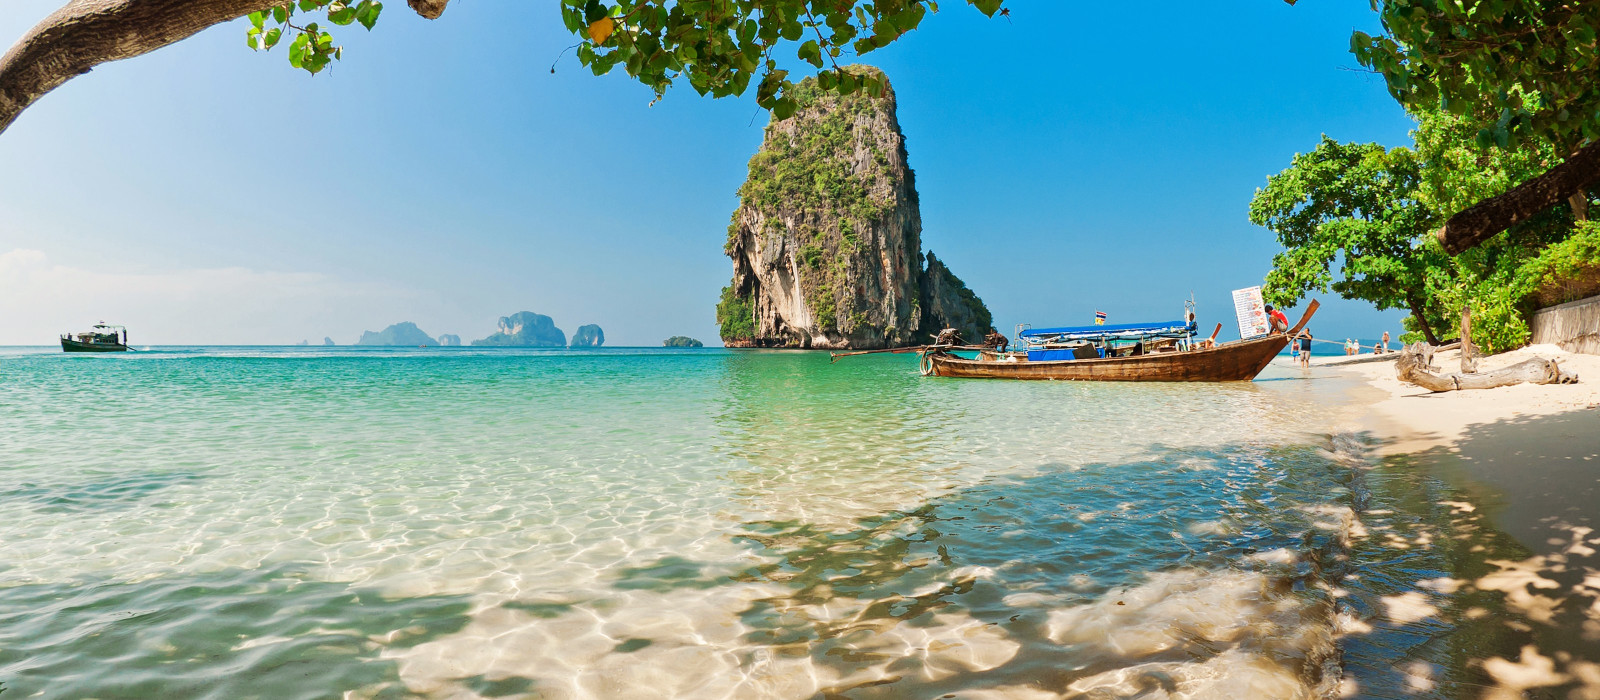 Luxury Thailand Cruise on The Moorings Tour Trip 1